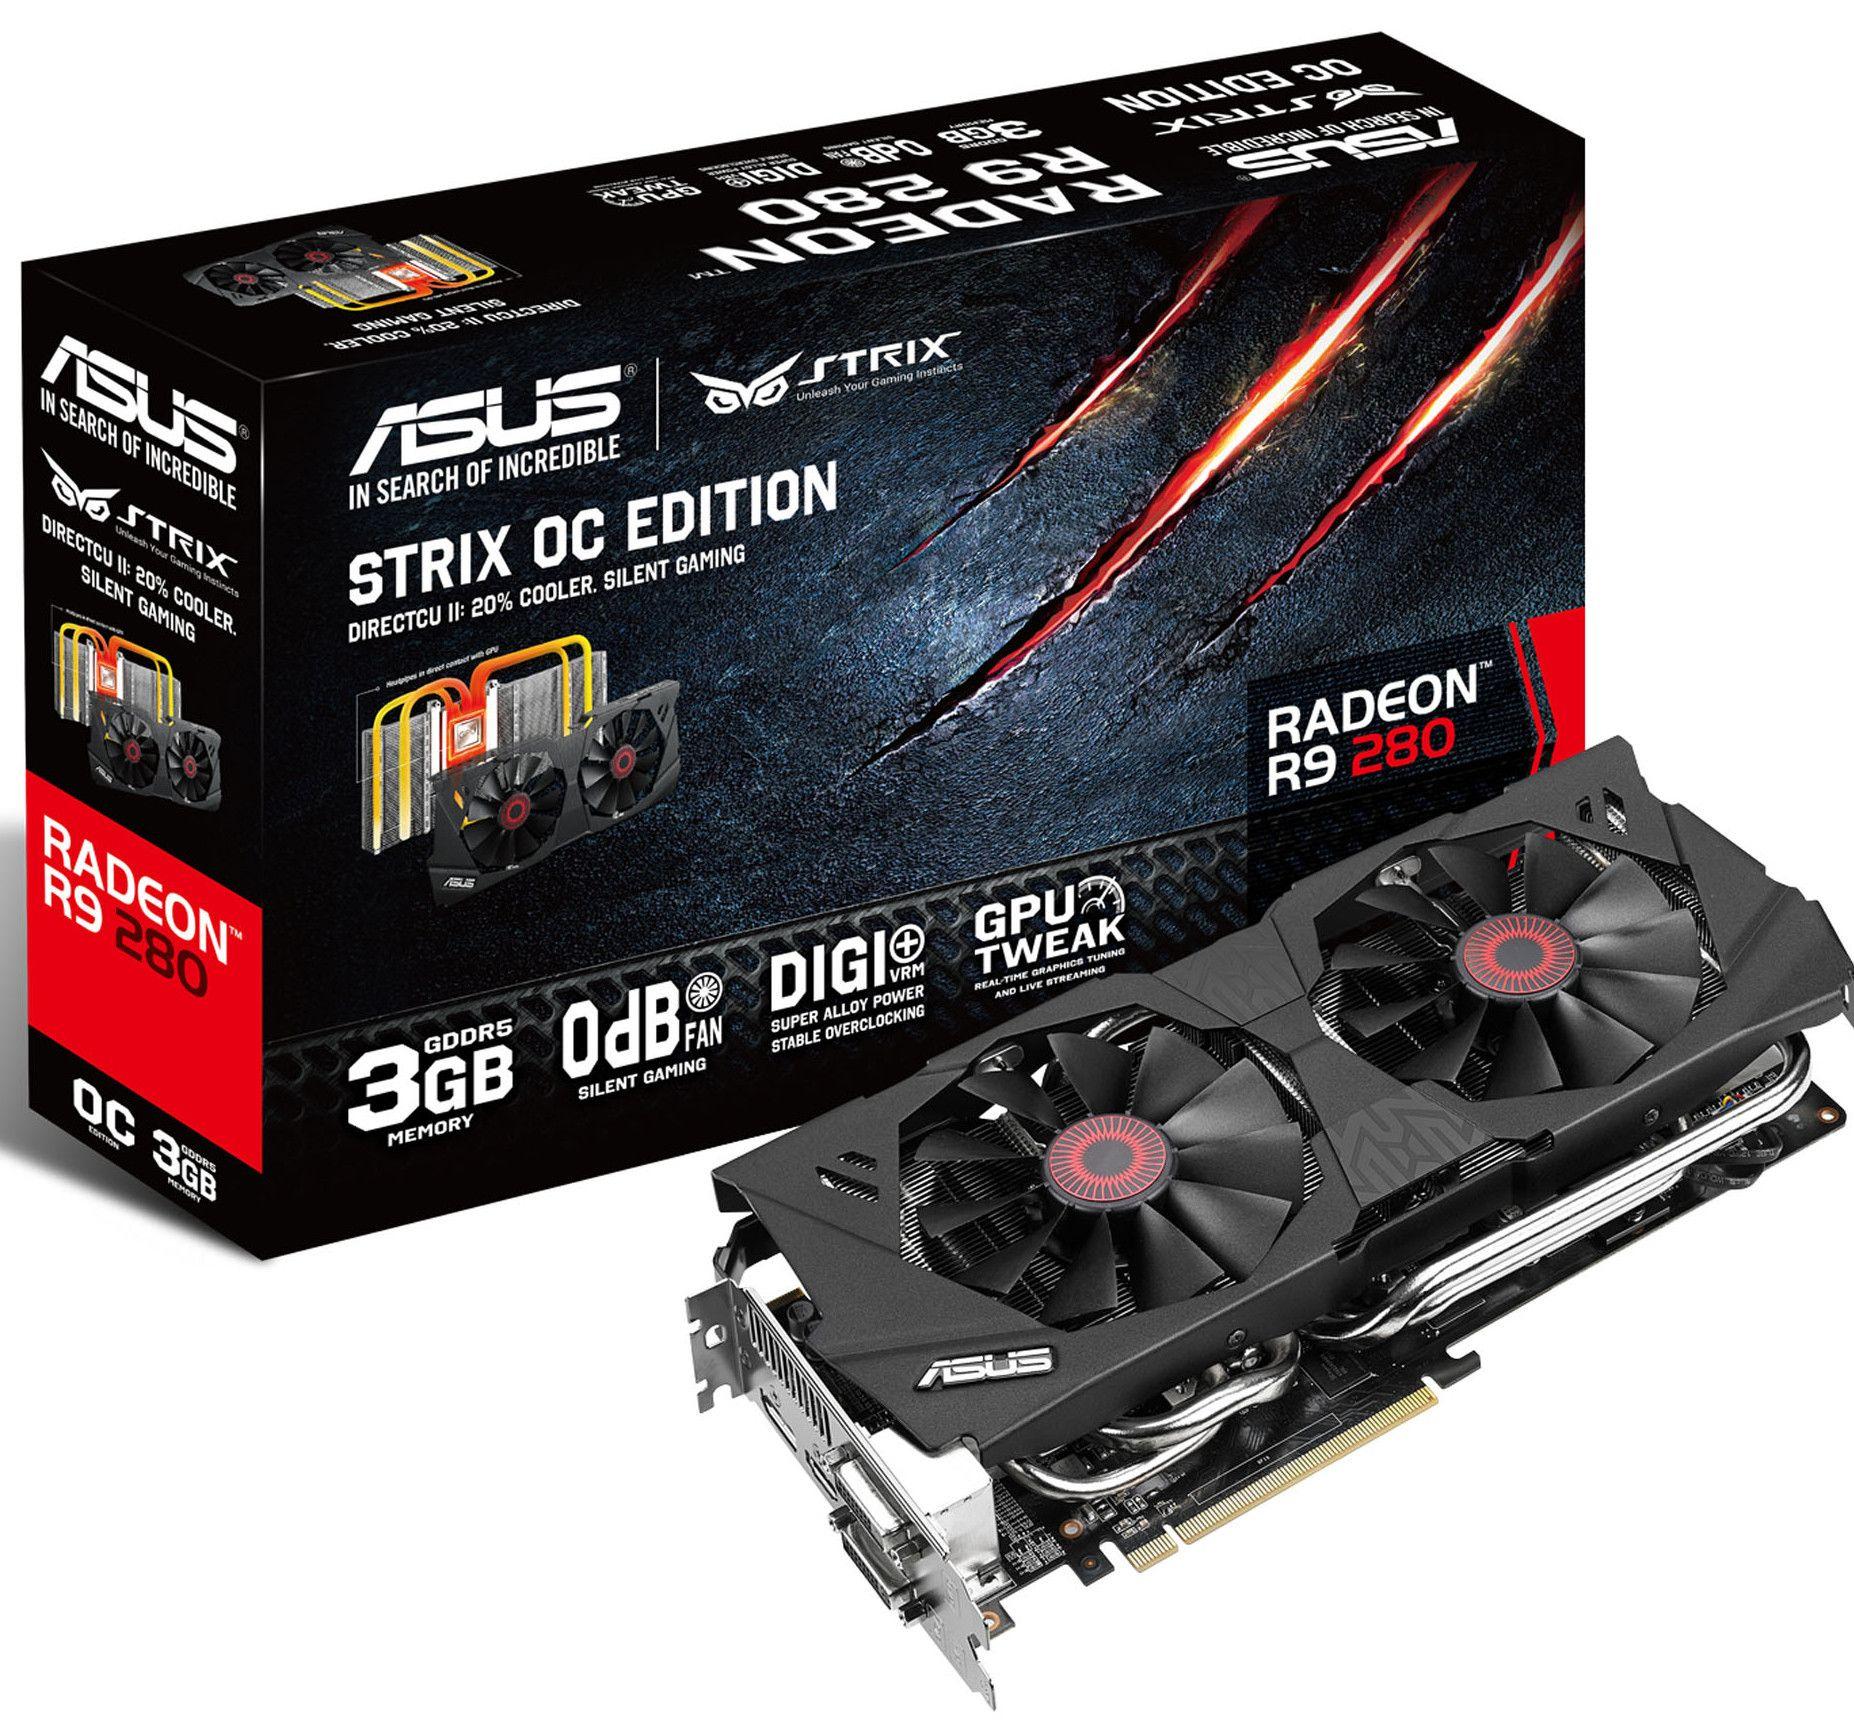 Asus Radeon R9 280 Strix.Foto: Asus